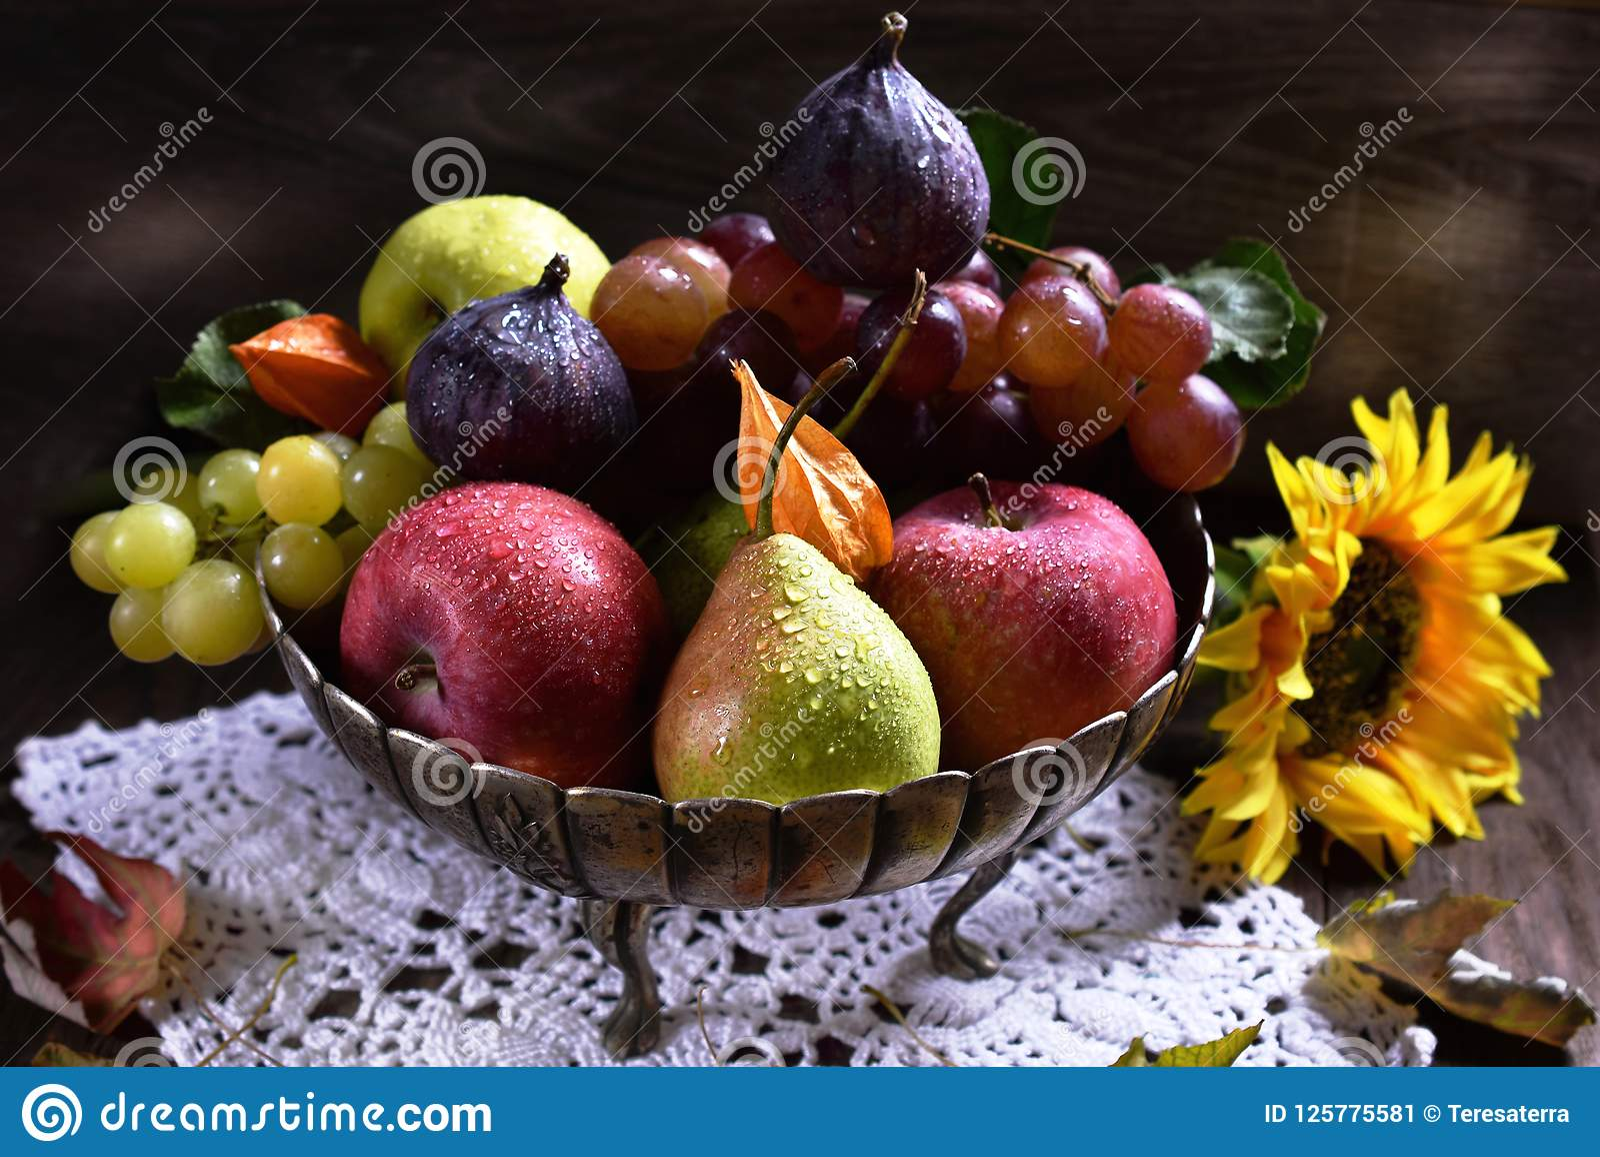 El otoño da fruto vida inmóvil